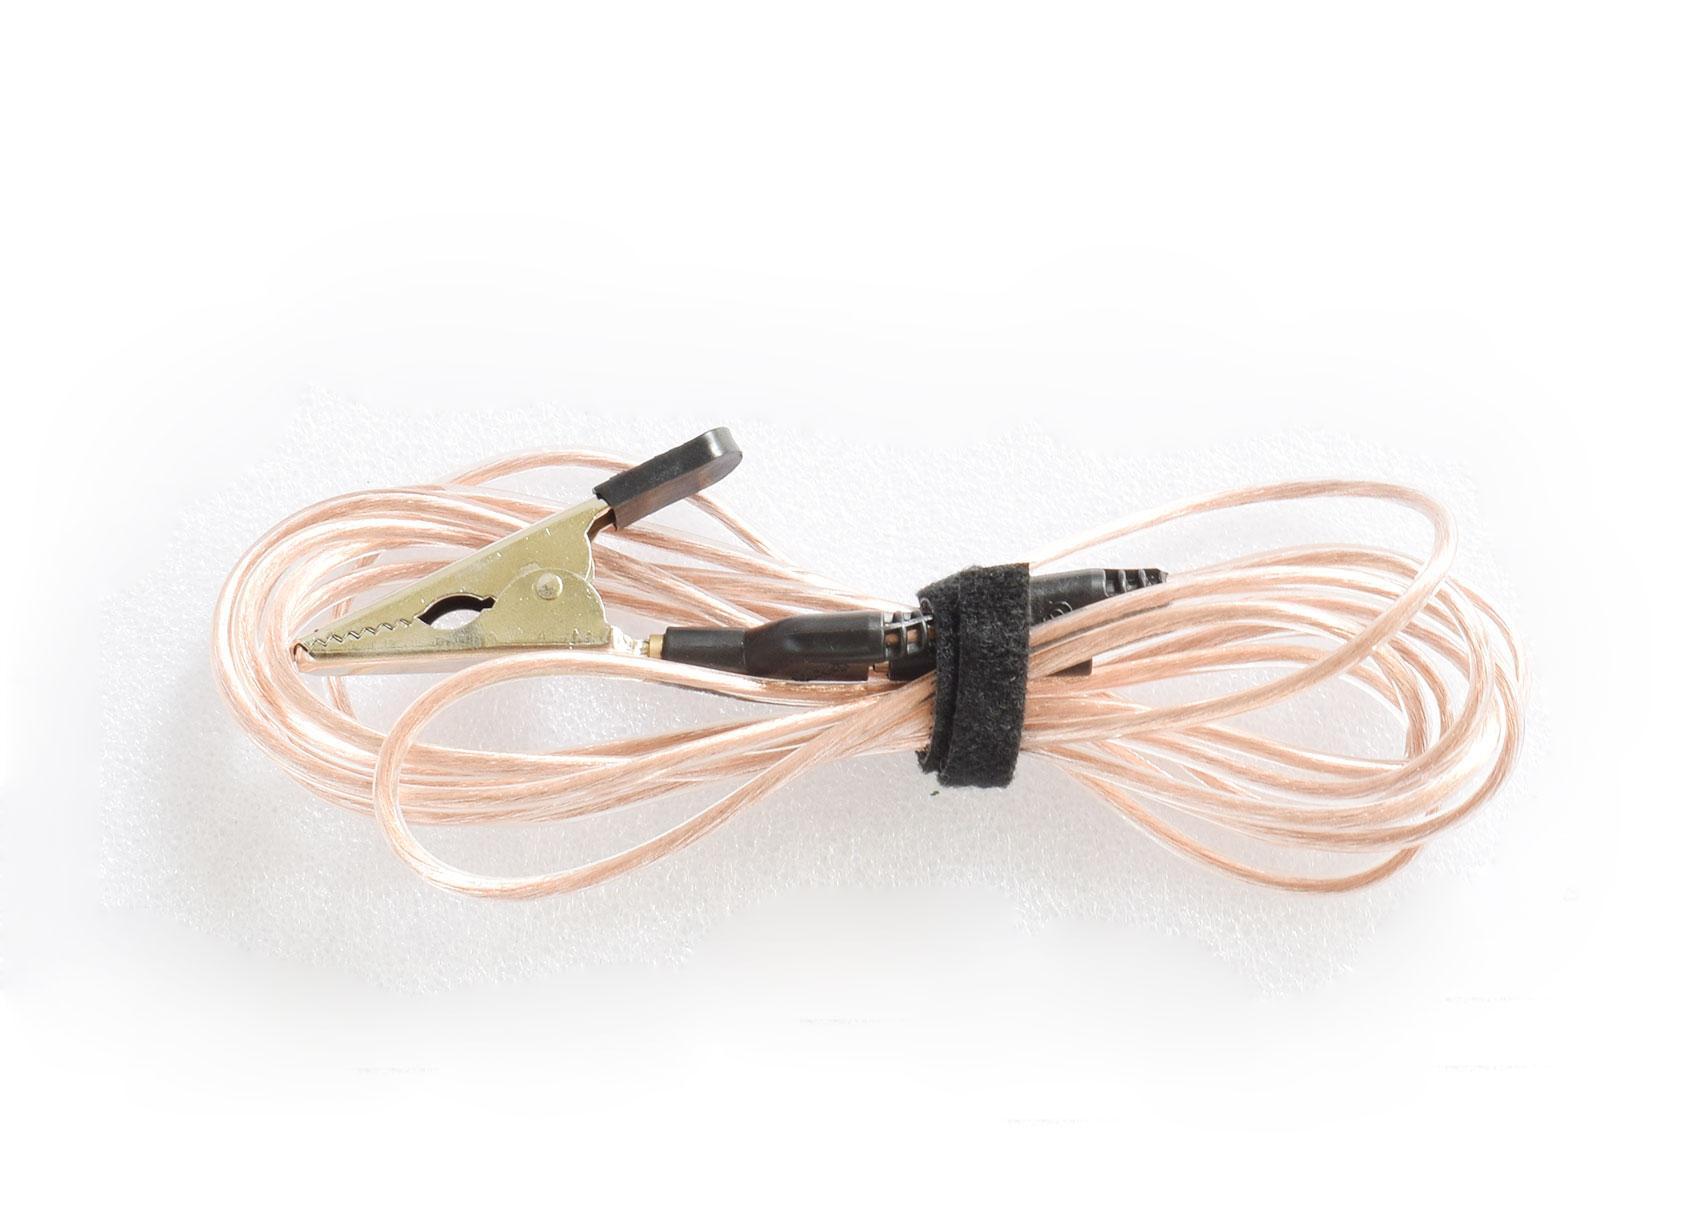 YTC316-10直流电阻测试仪连接线3